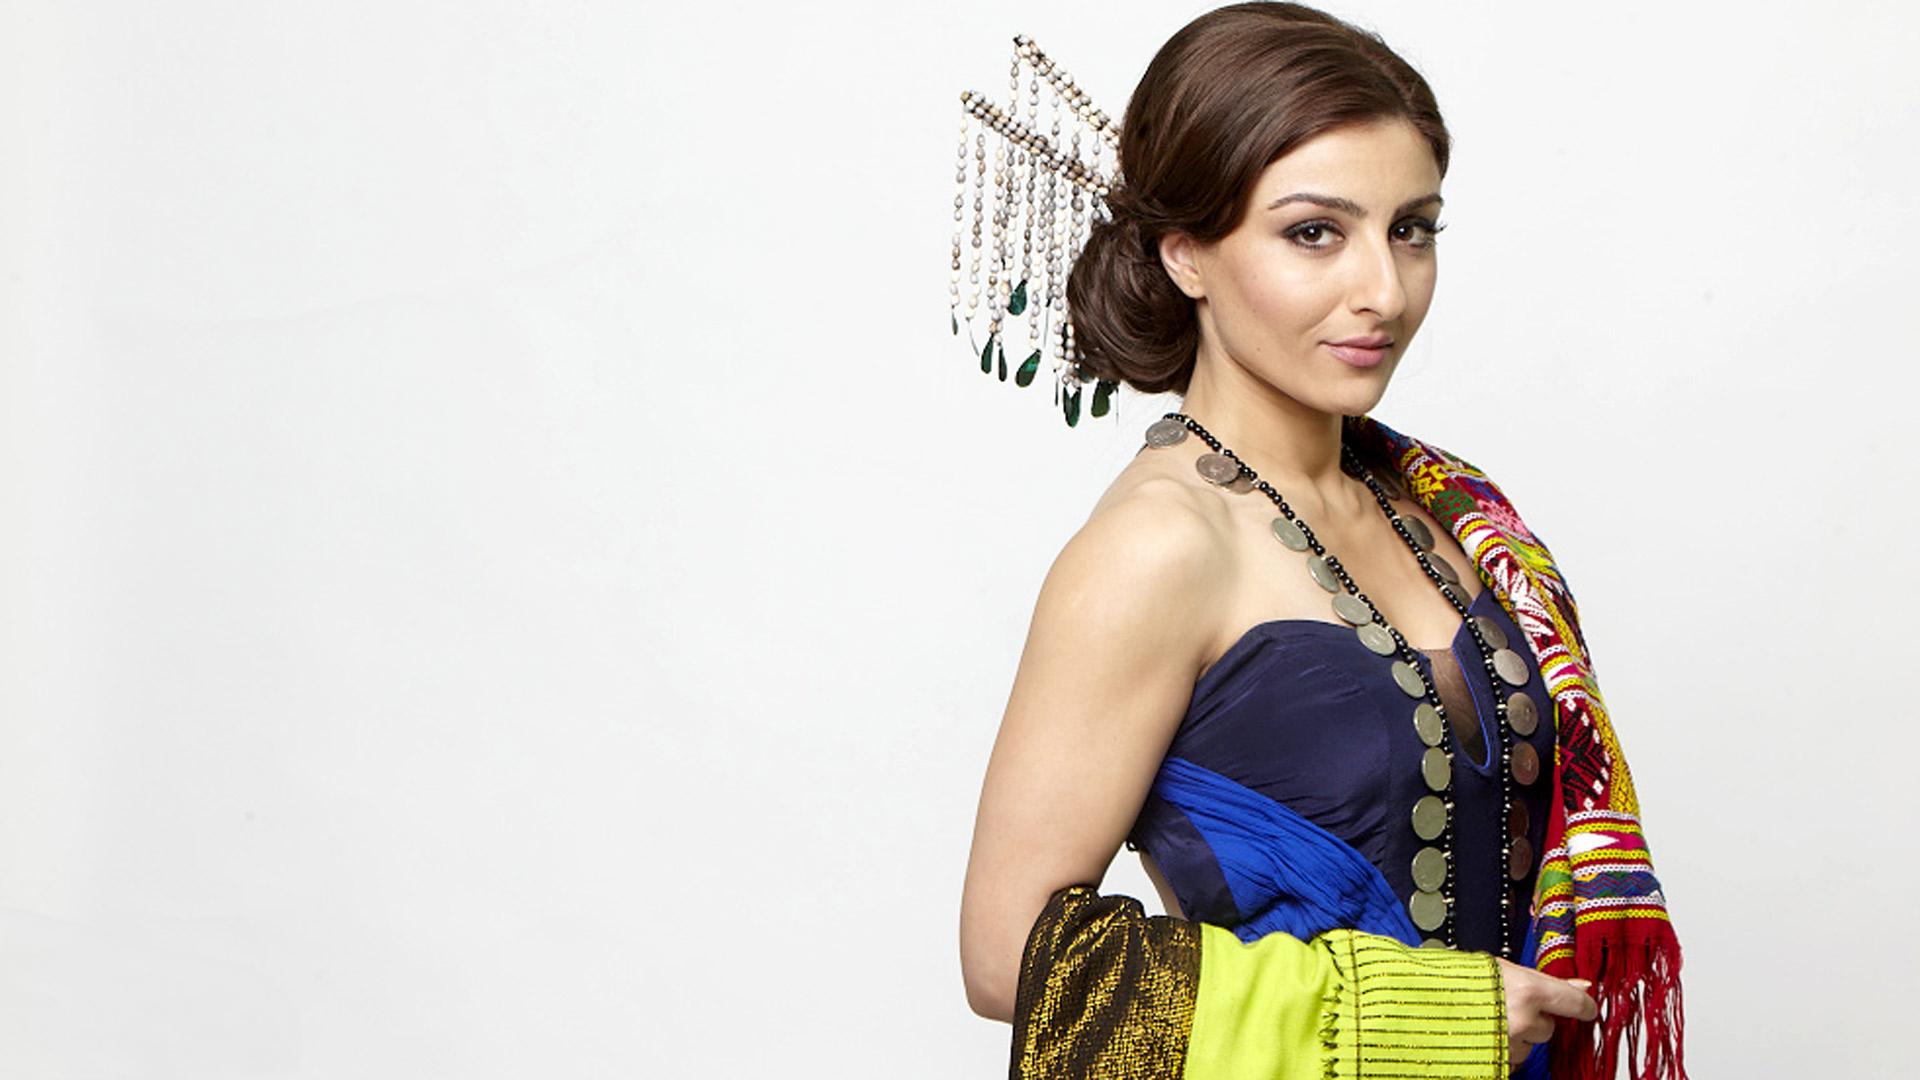 facebook covers for soha ali khan • popopics